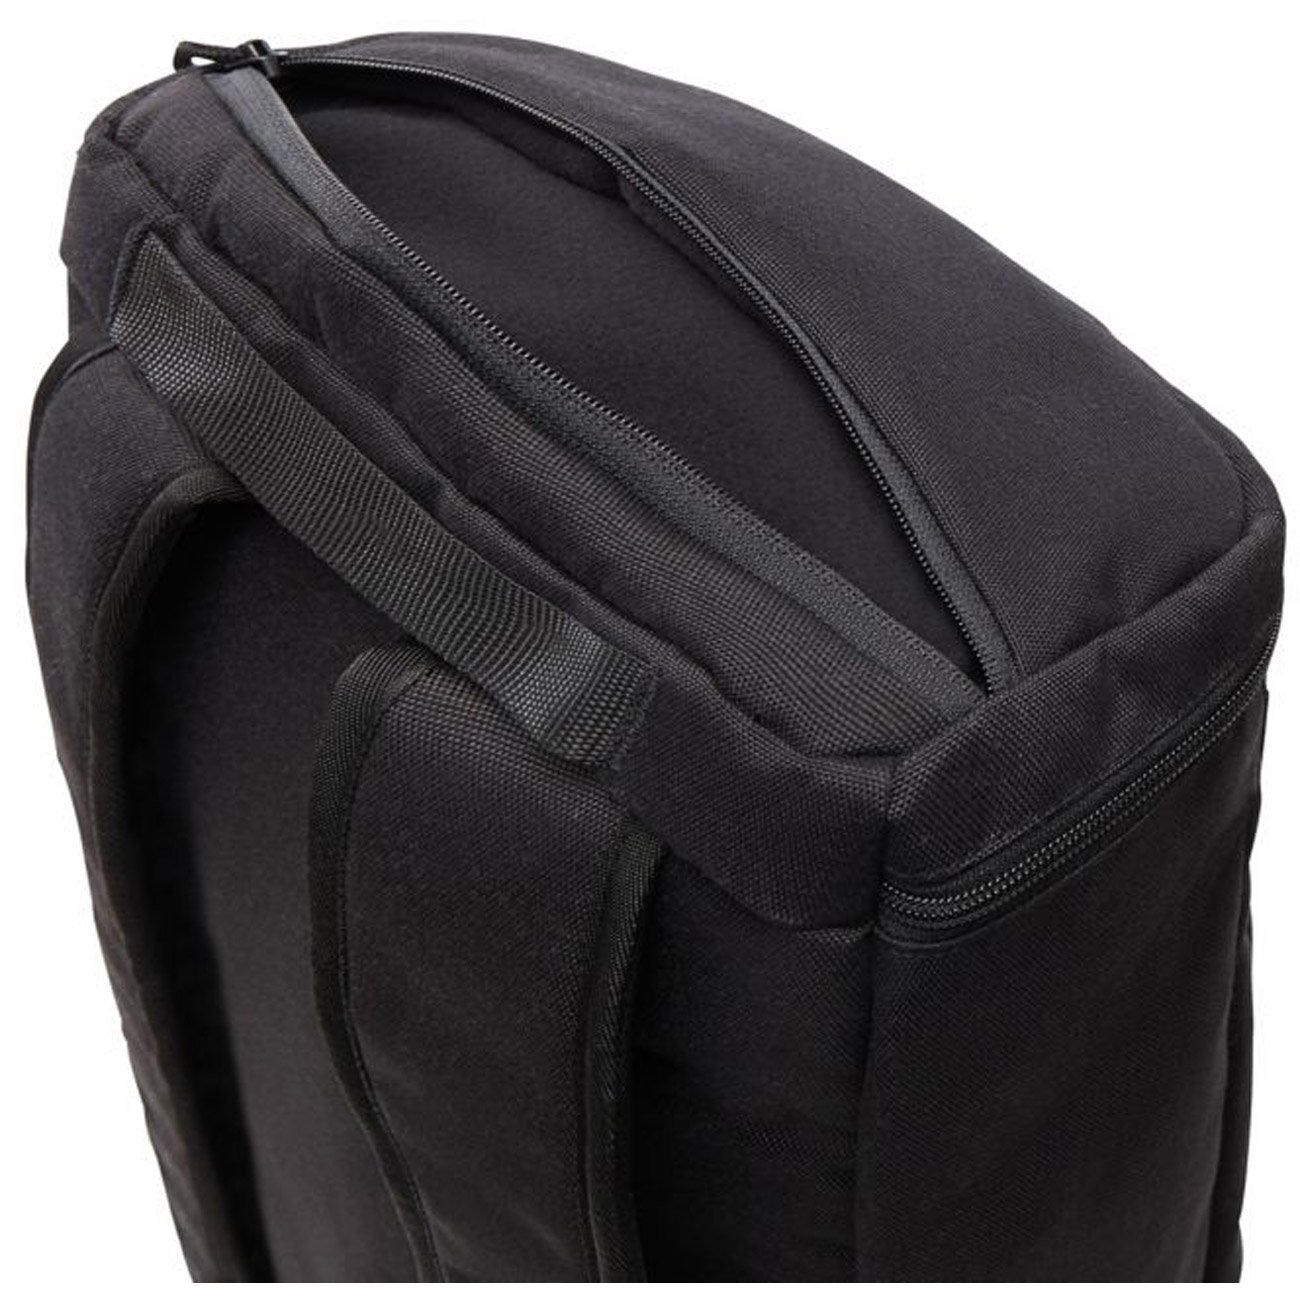 Amazon.com  Vans Hooks Skatepack Black School Pack Backpack  Sports    Outdoors f9f6ff6230